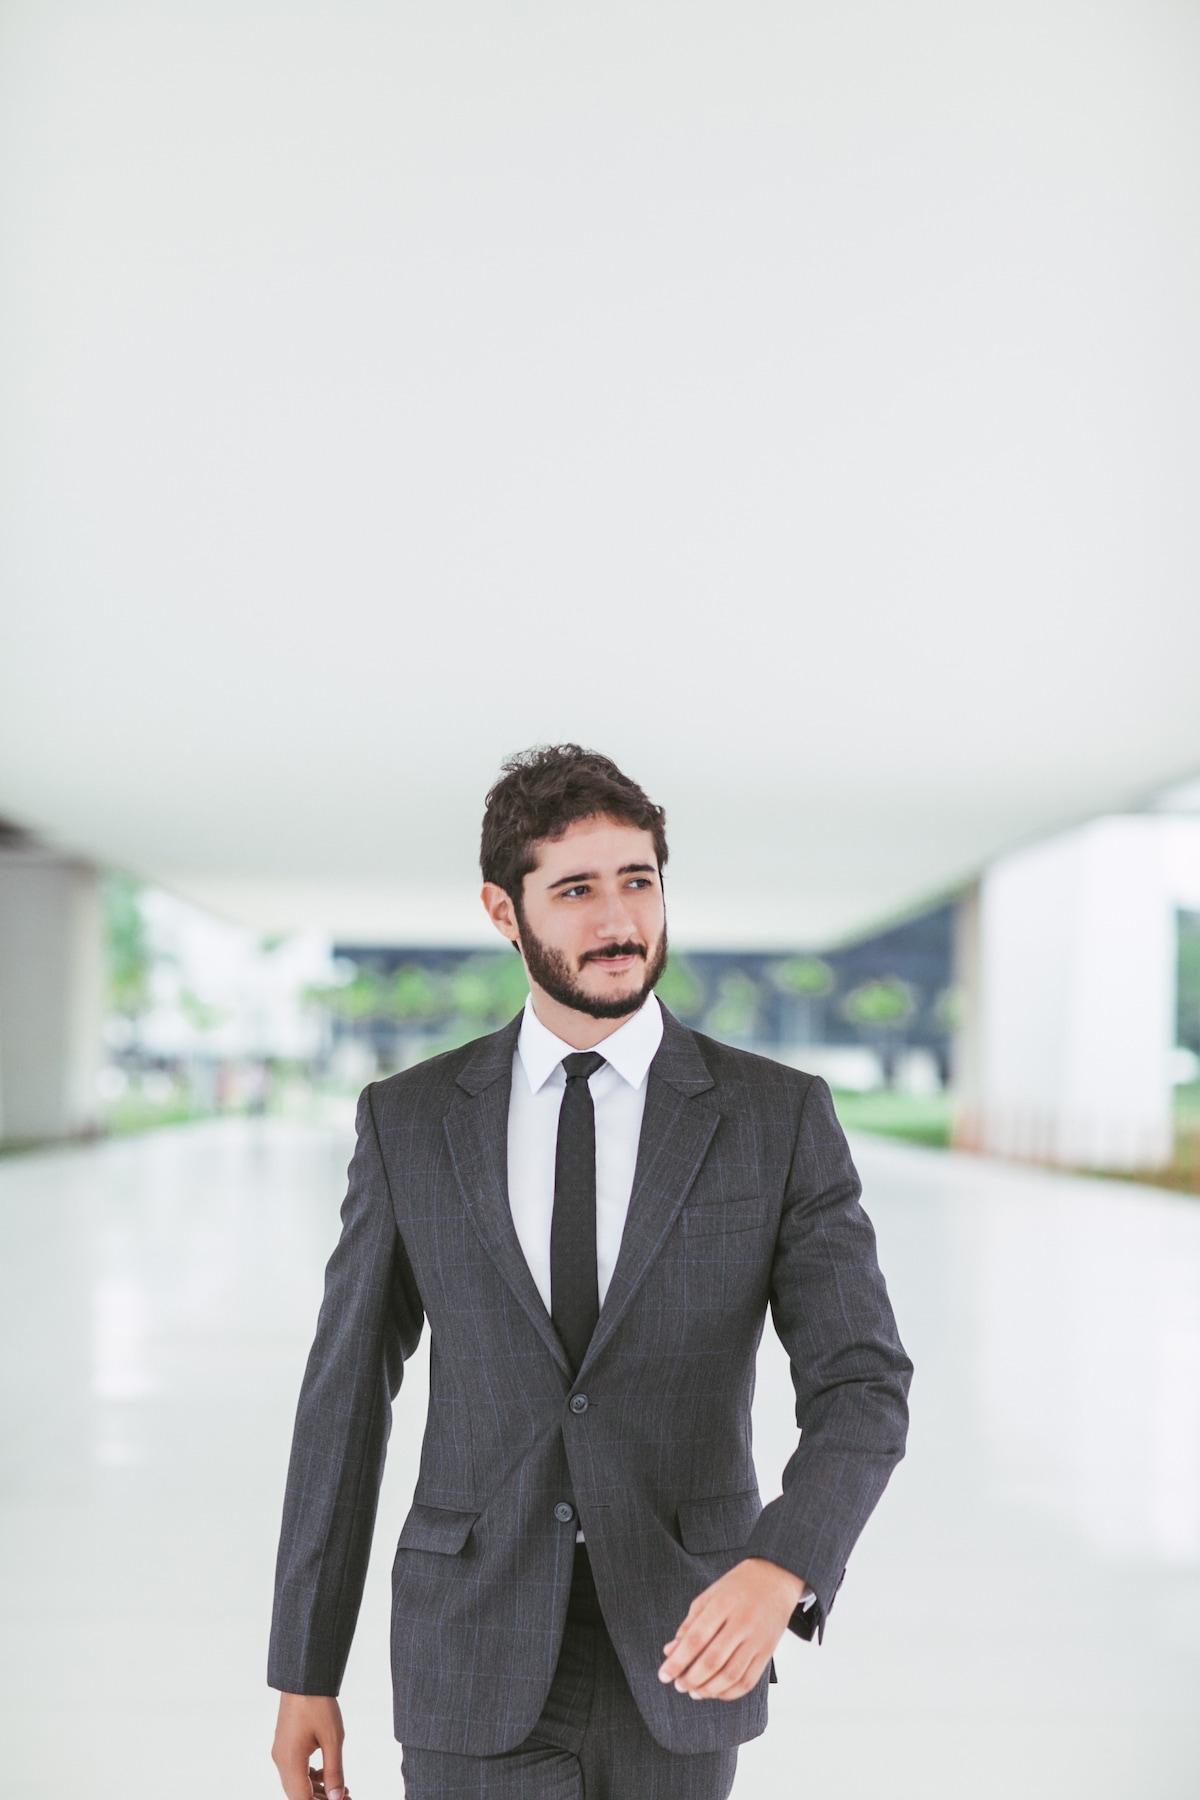 Gabriel from Belo Horizonte